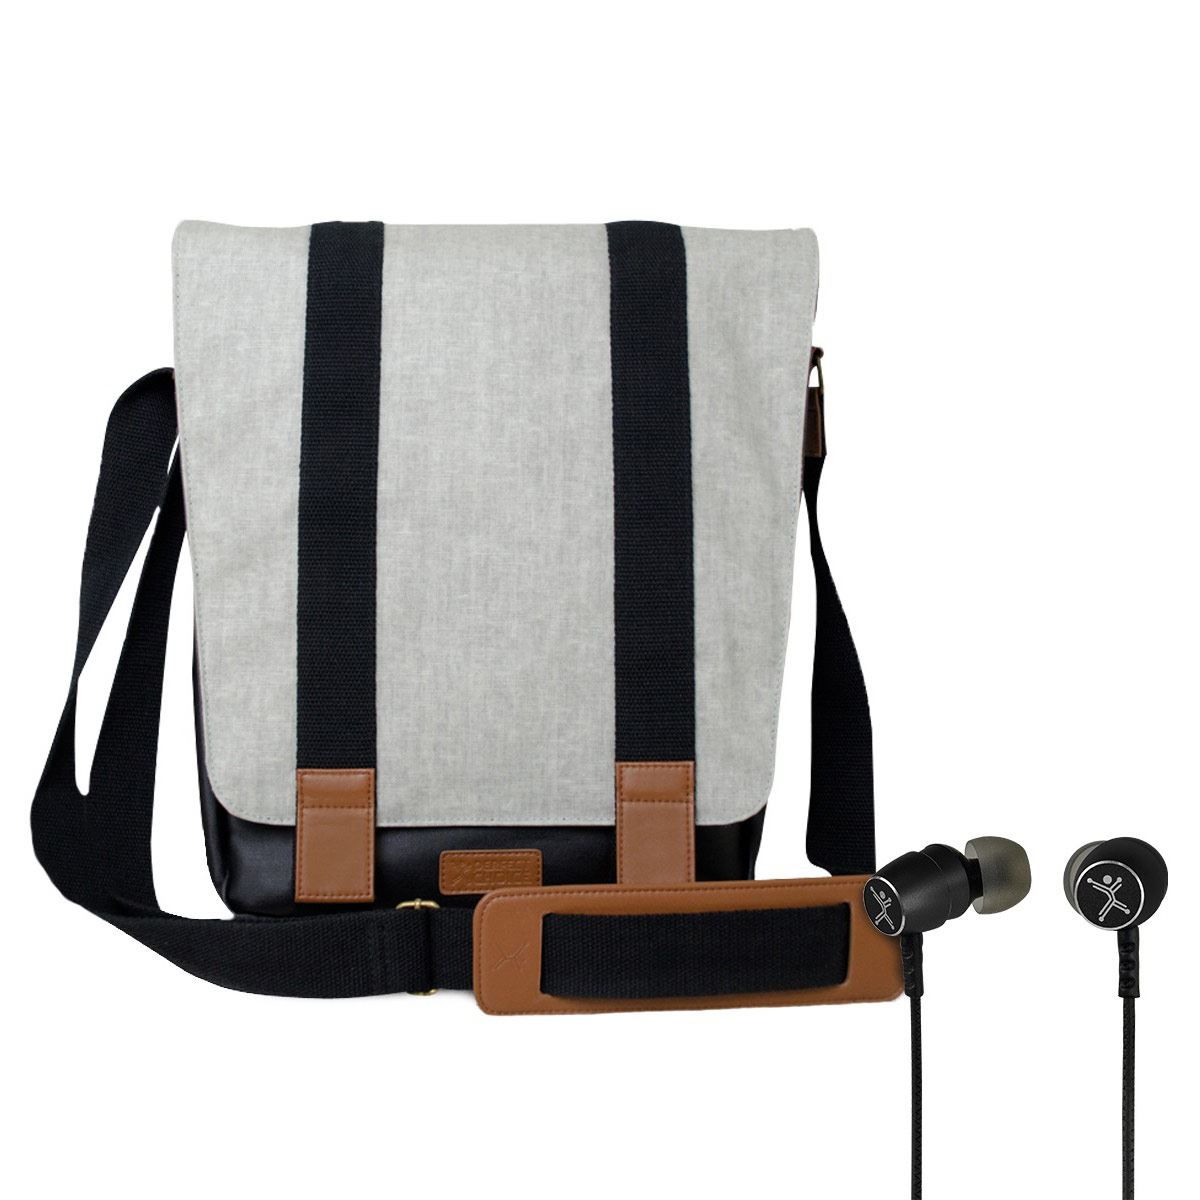 Kit Messenger + Audífonos Staccato Perfect Choice